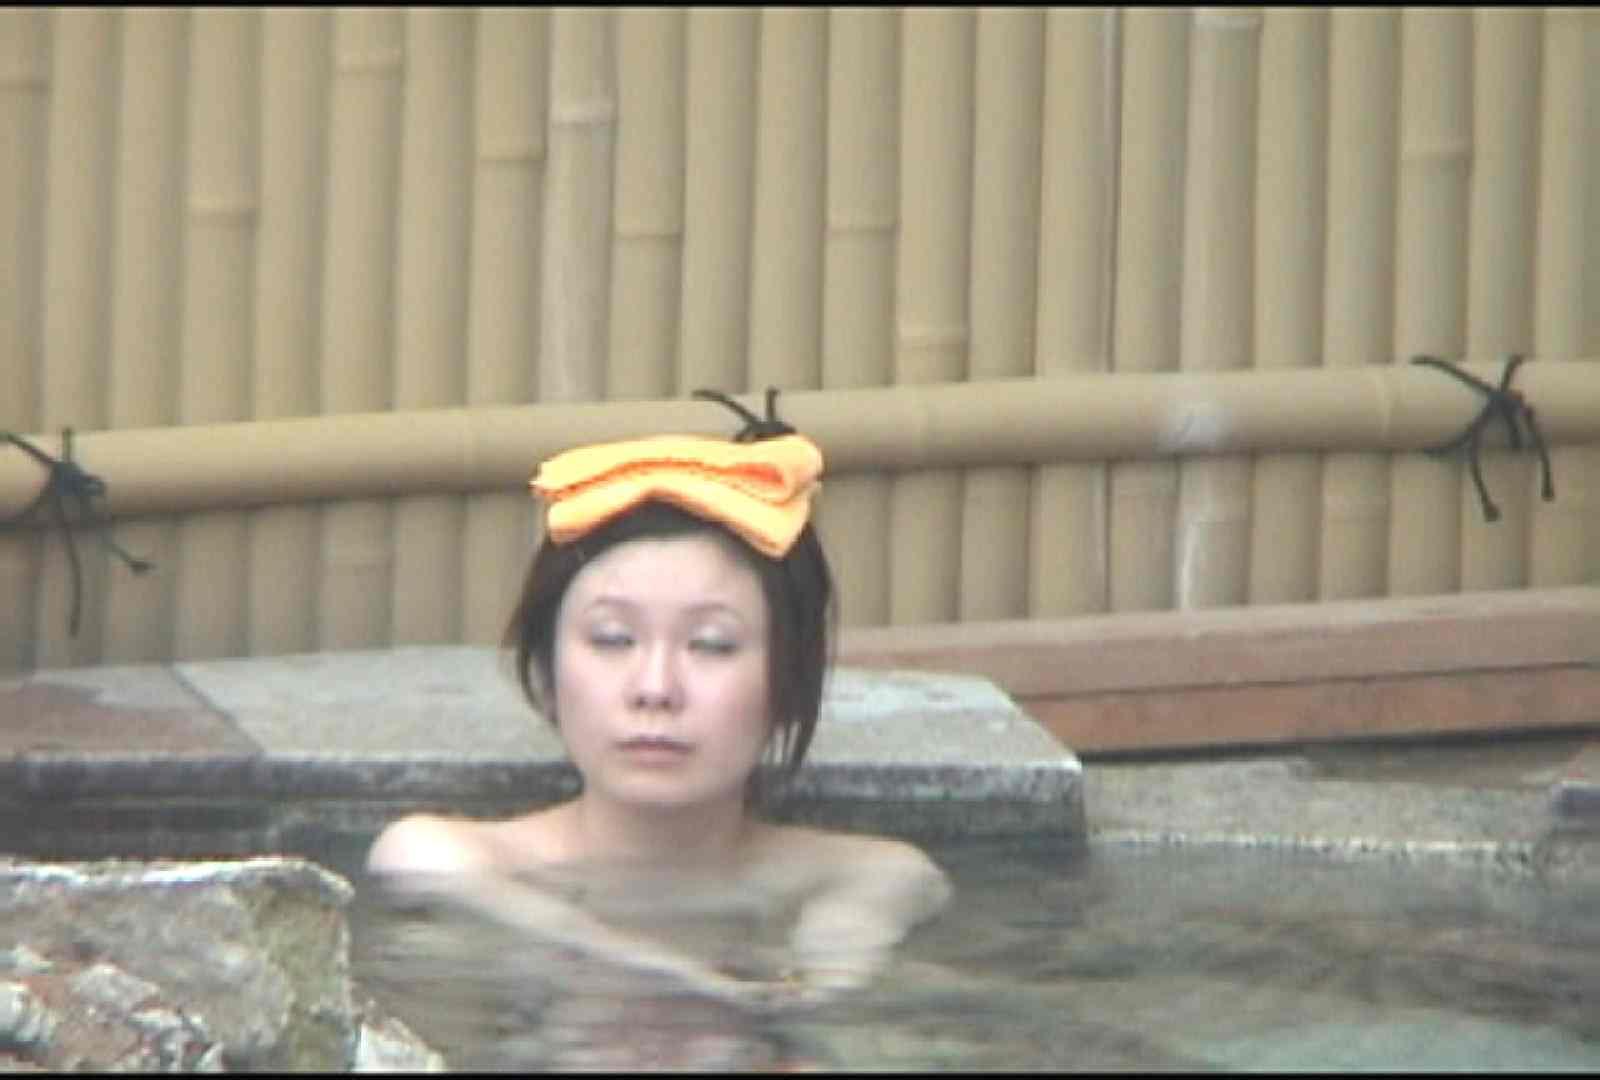 Aquaな露天風呂Vol.177 盗撮師作品  102pic 27